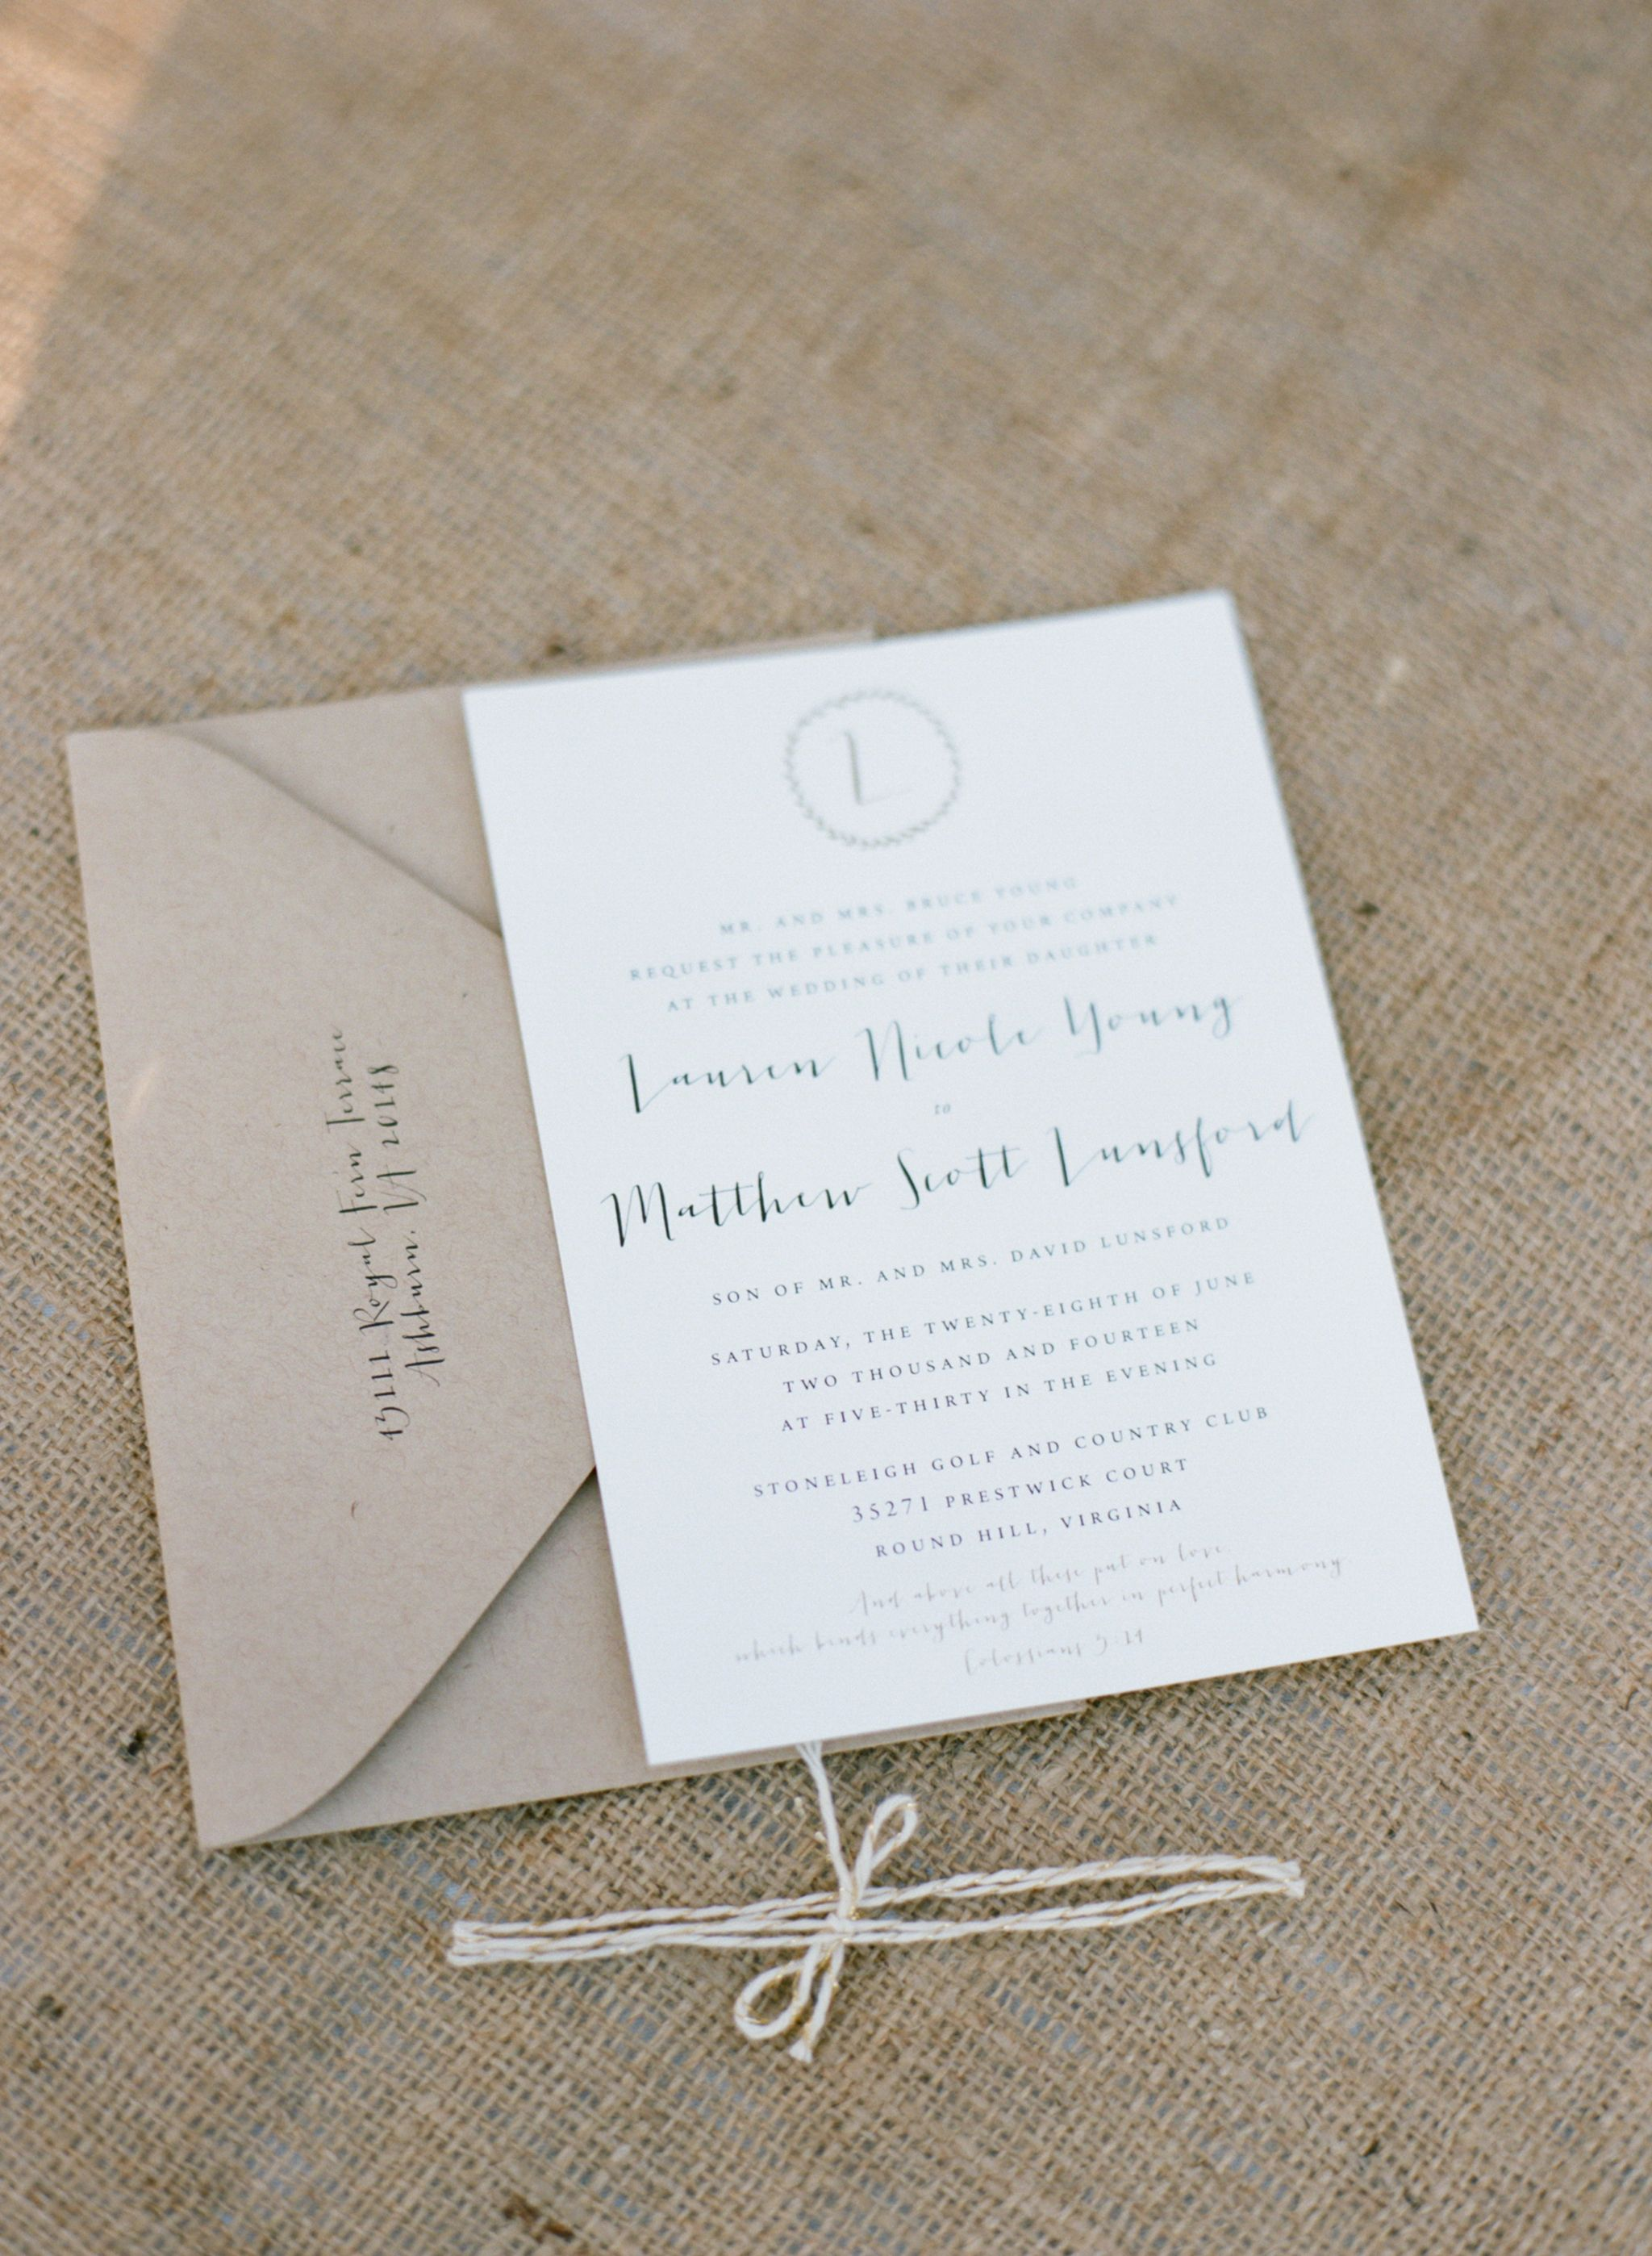 handwrite or print wedding invitation envelopes%0A Weddings    Lauren  u     Matthew on Borrowed  u     Blue  Photo Credit  Lauren Modny  Photography Invitation